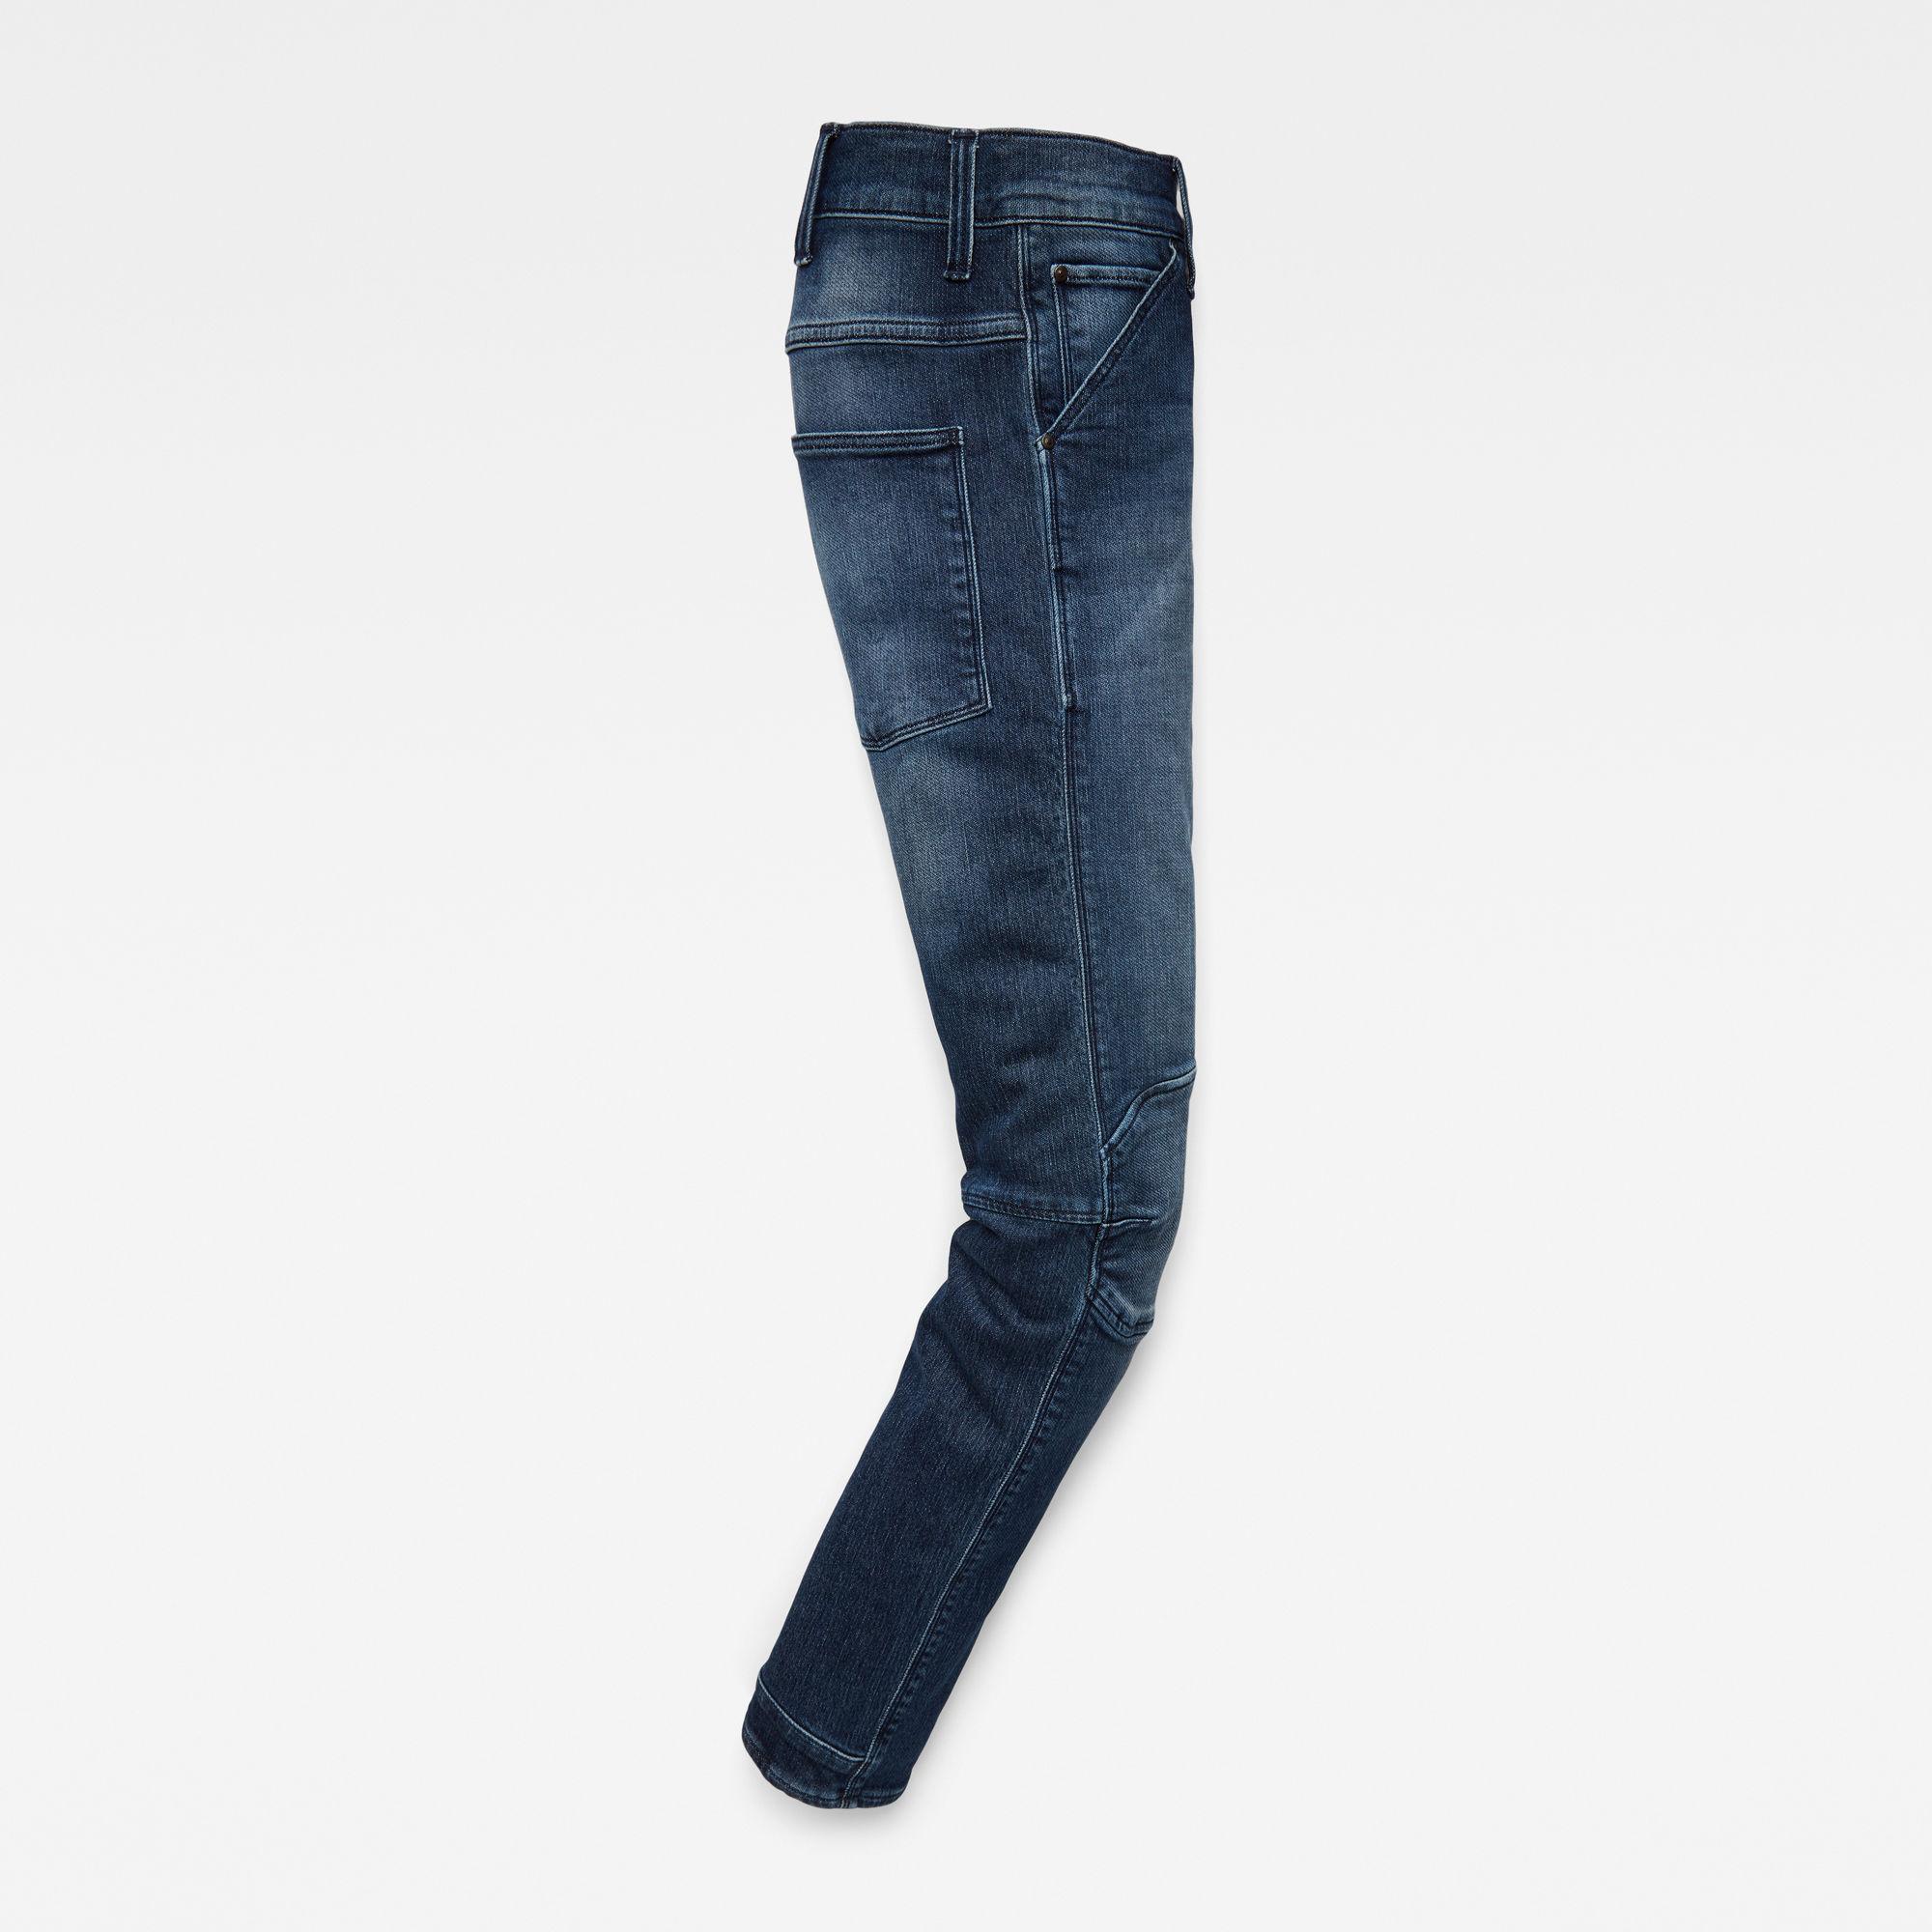 5622 G-Star Elwood Slim Jeans